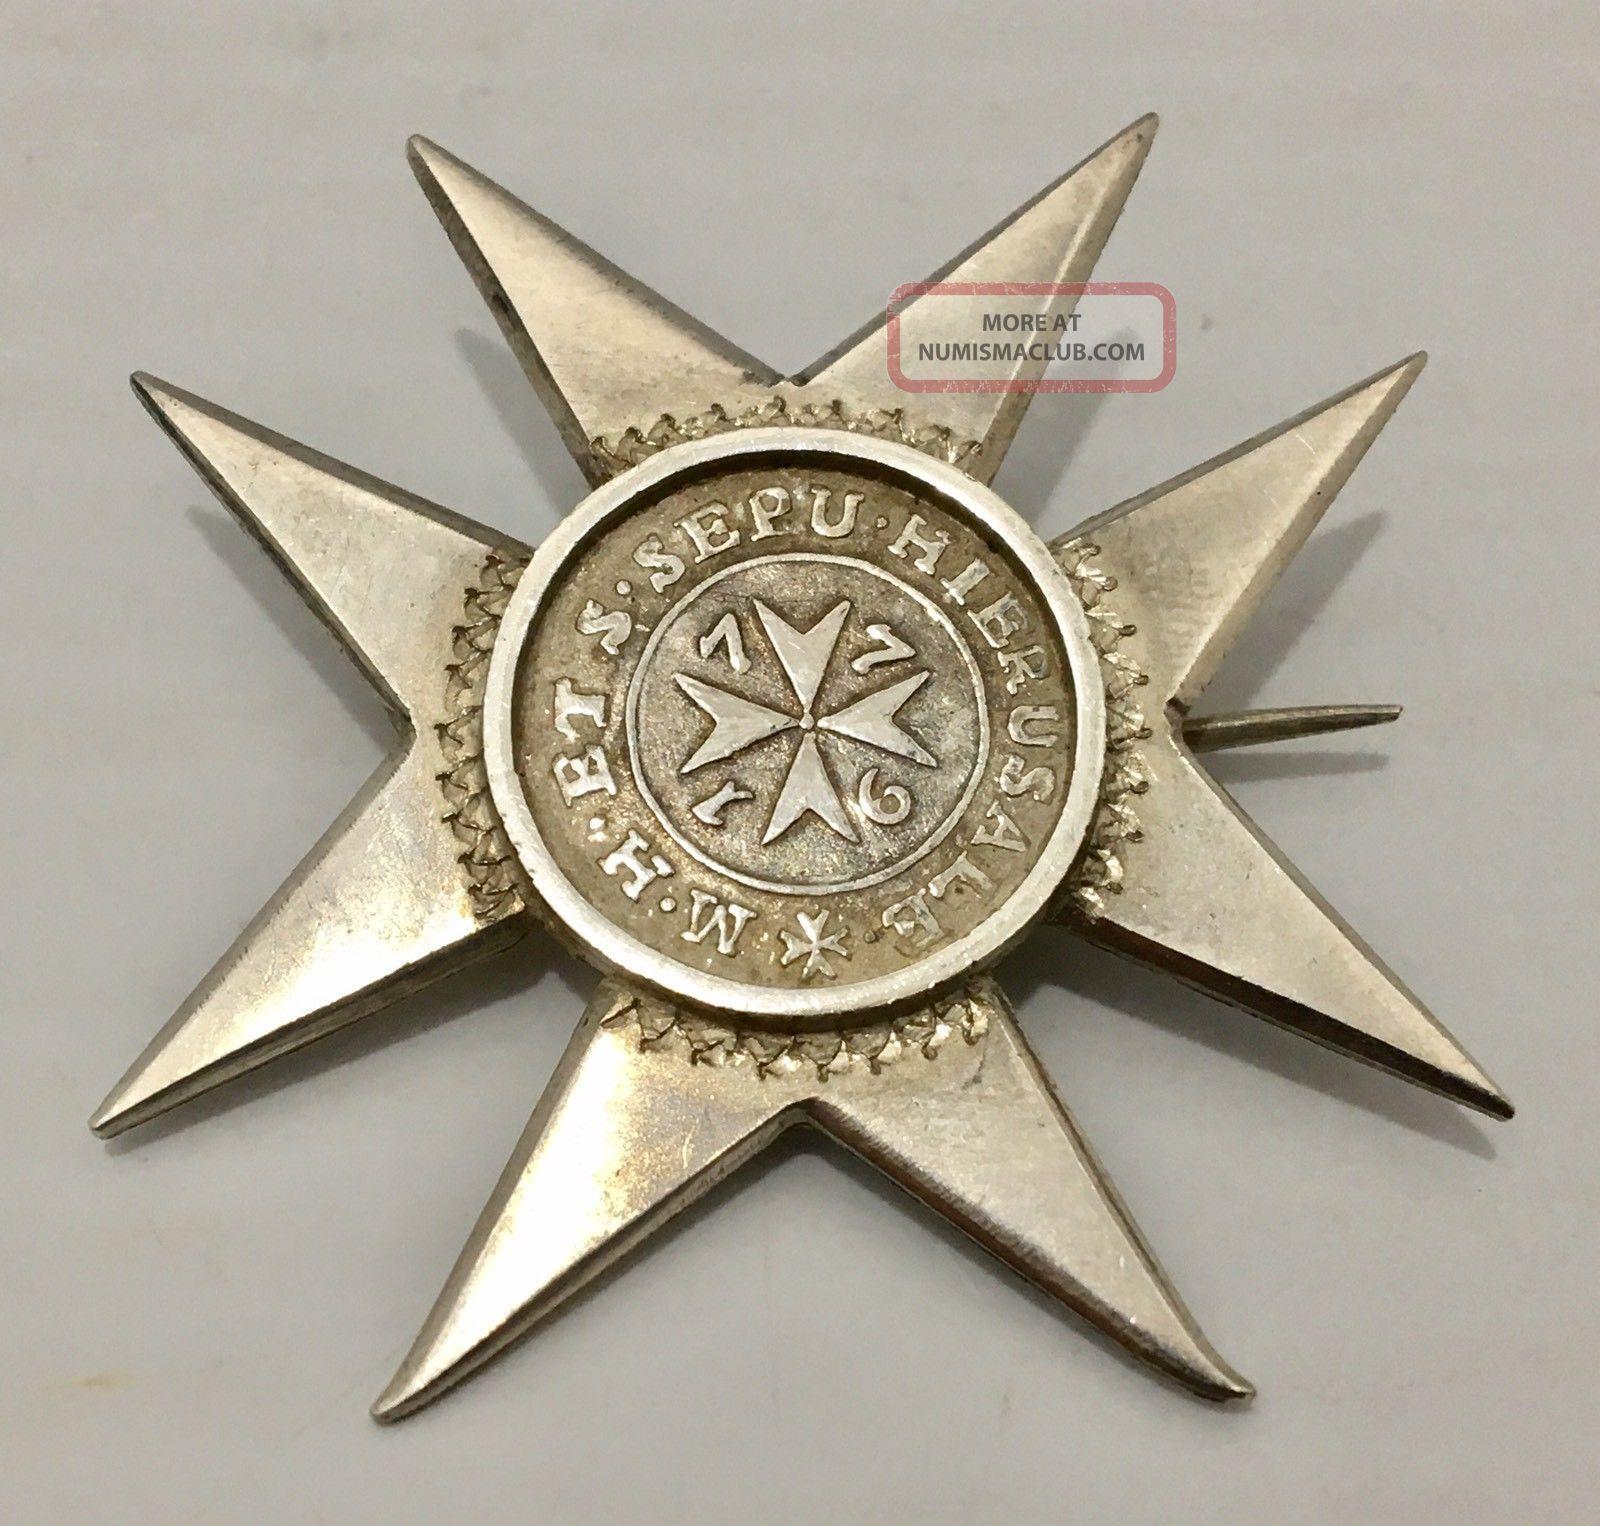 Unique 1776 Malta 2 Tari Silver Coin Emmanuel De Rohan M.  Cross Star Brooch Pin Coins: World photo